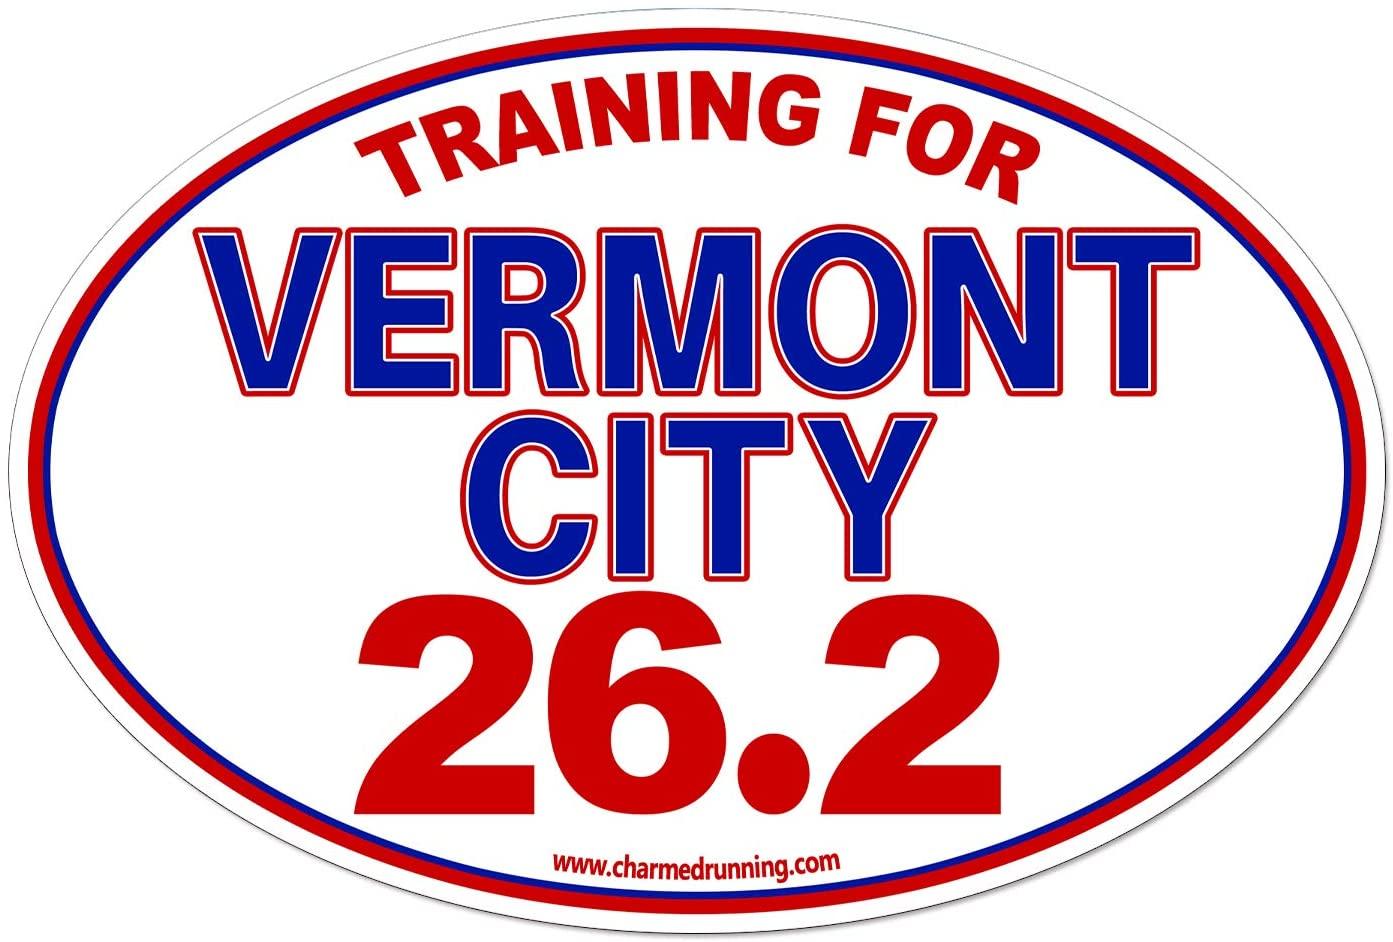 Charmed Running Training For Vermont City Marathon 26.2 Car Magnet